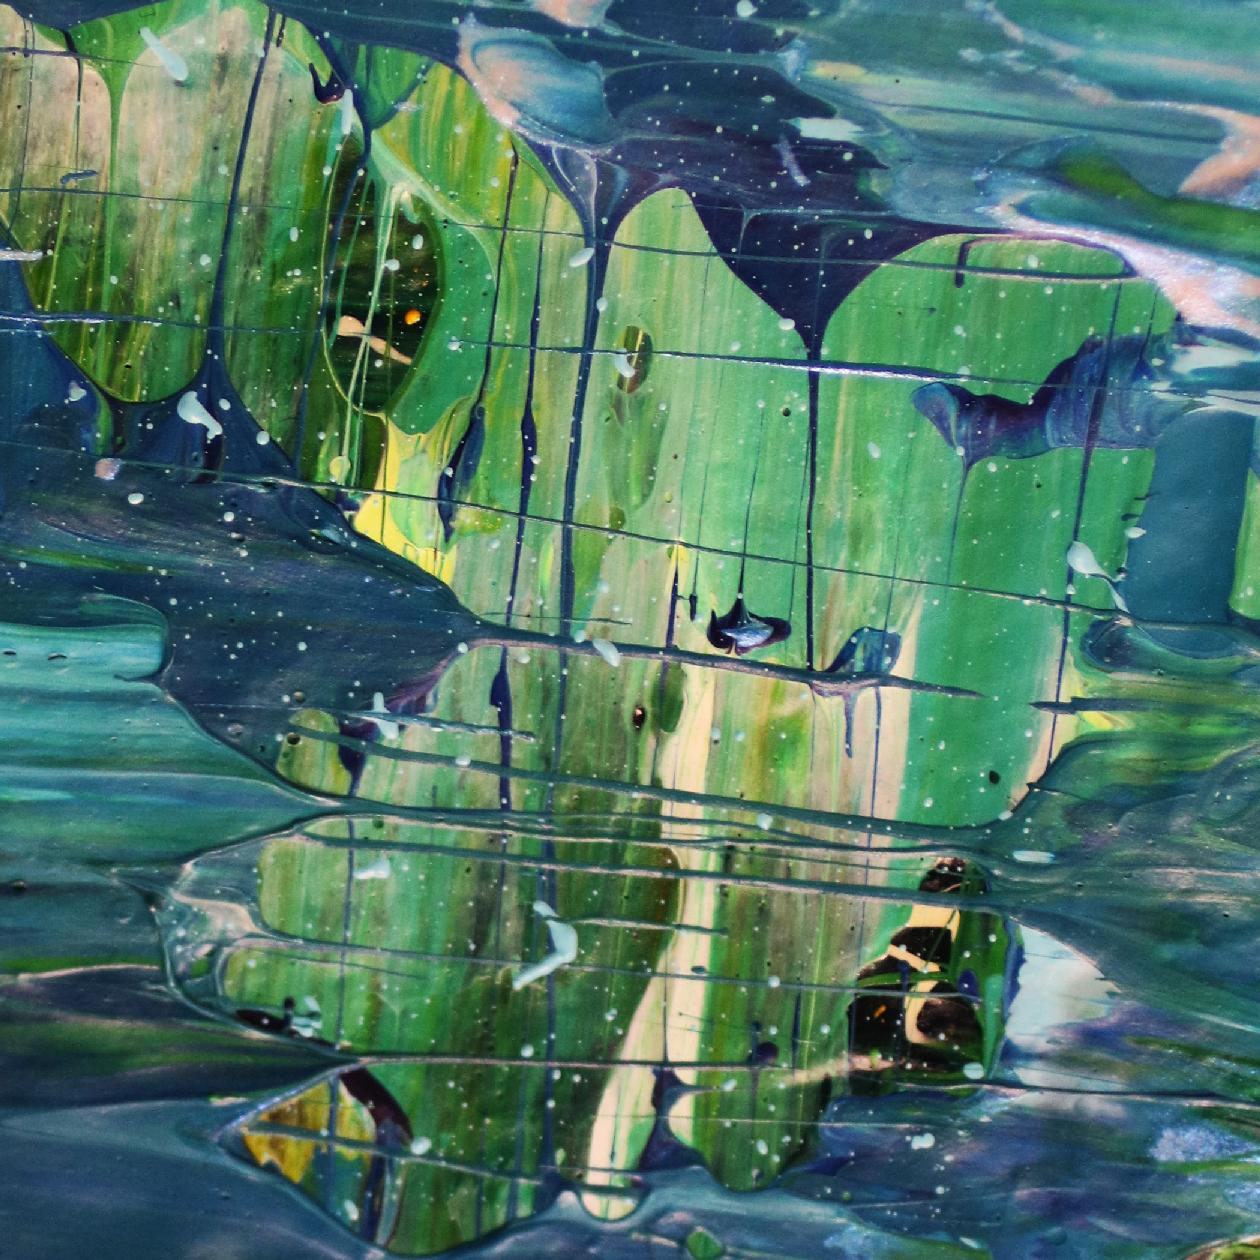 Detail - Blue satin waves 2 by Nestor Toro - 2020 - SOLD